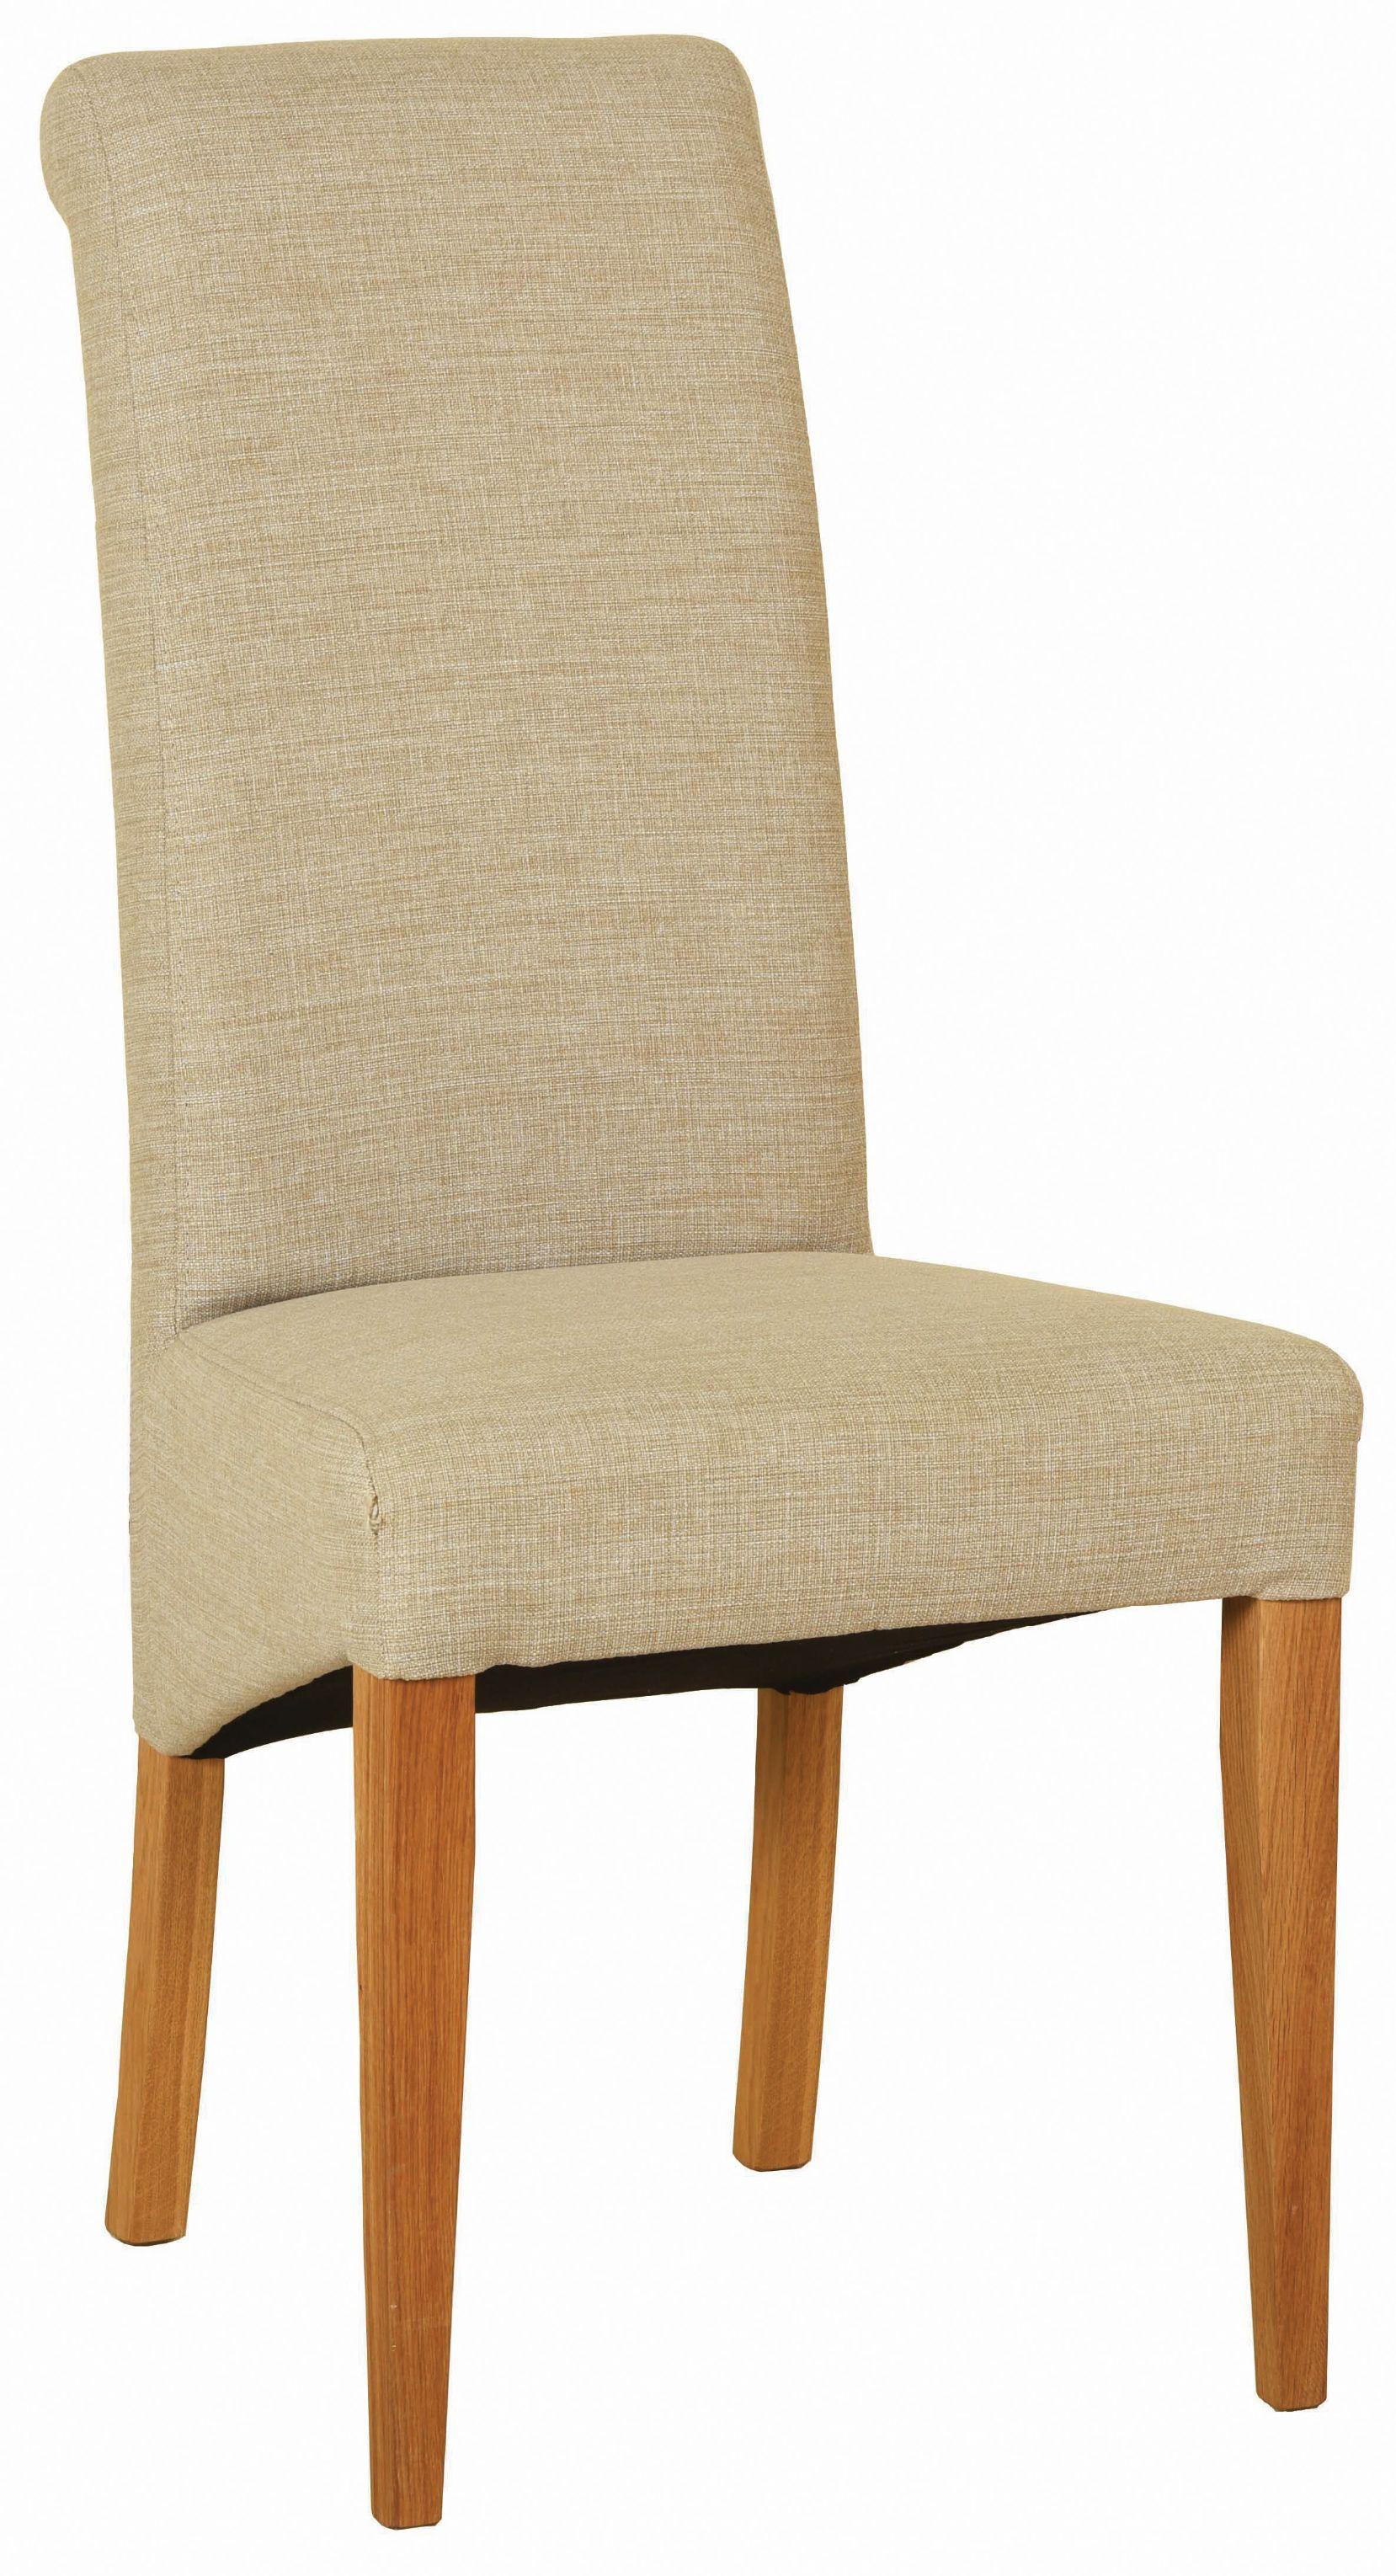 Dorchester Oak Fabric Dining Chair Beige